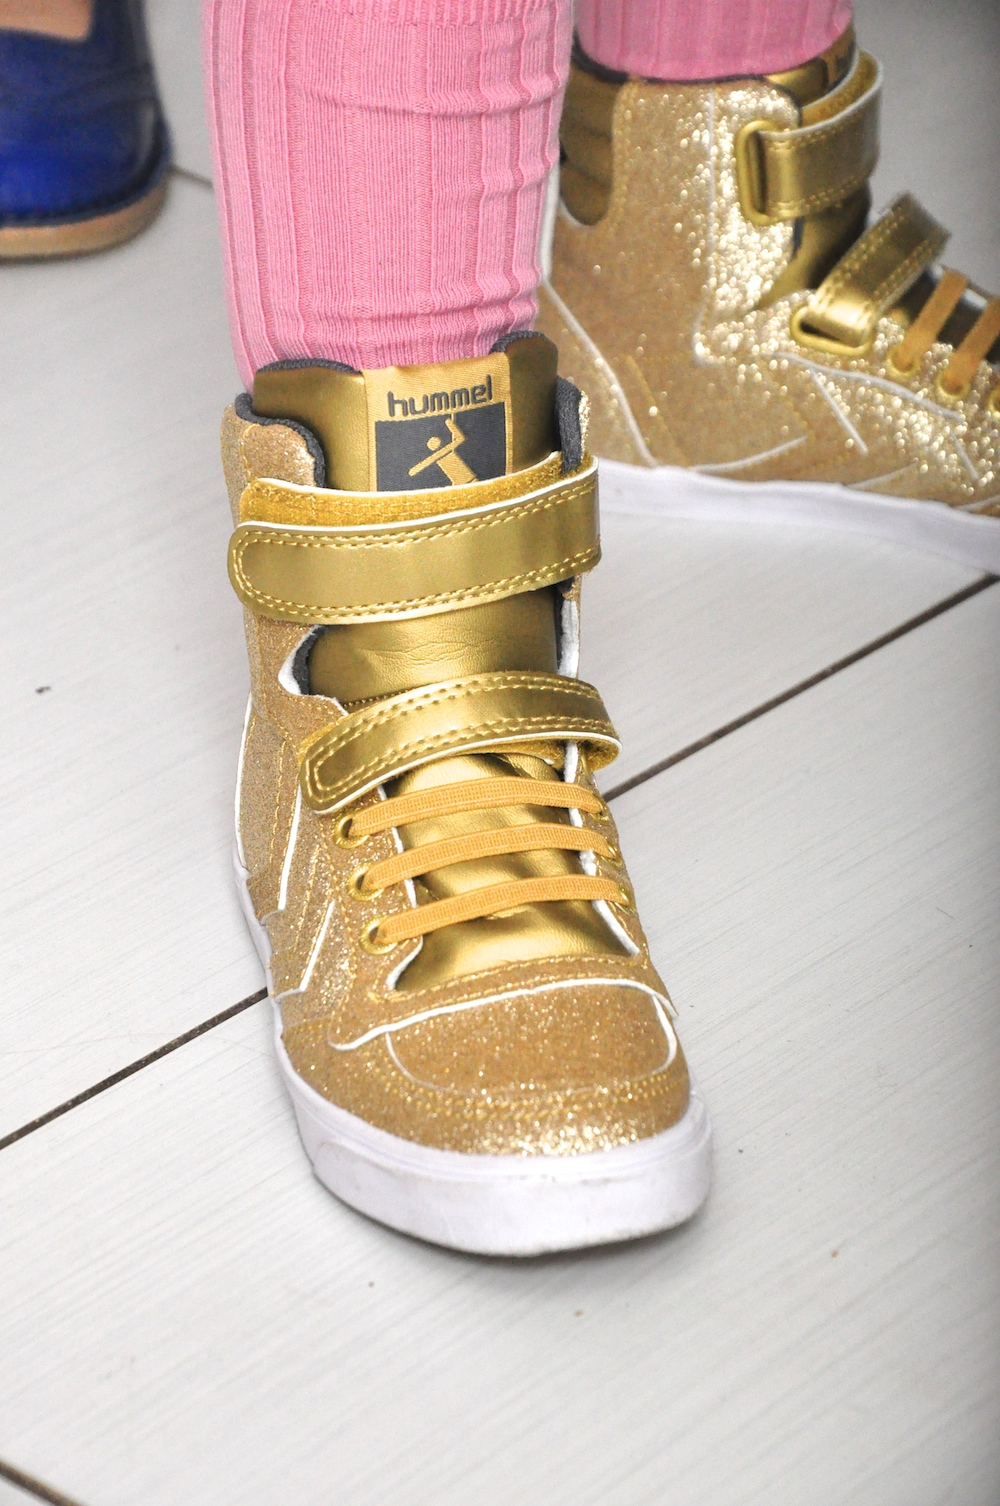 Kidsen_trainers_shoes_hummel_glitter